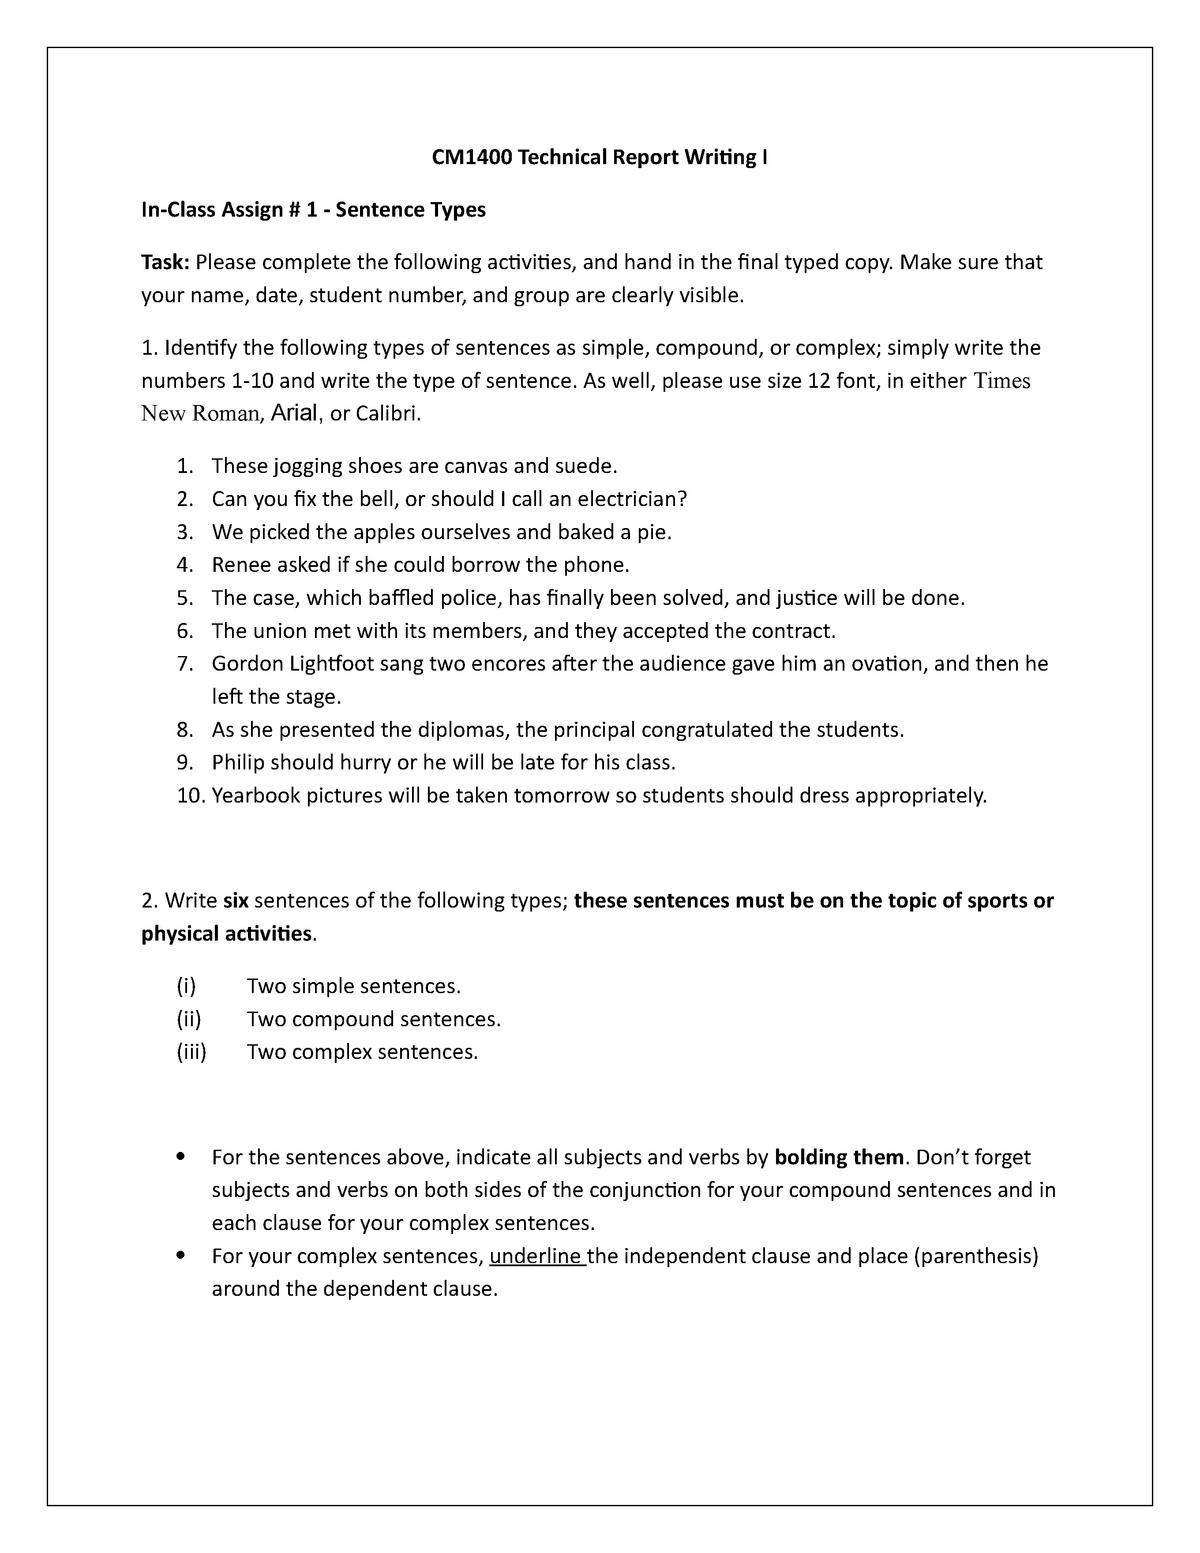 In-class Assignment #1 Sentences - CM1400: Technical Report